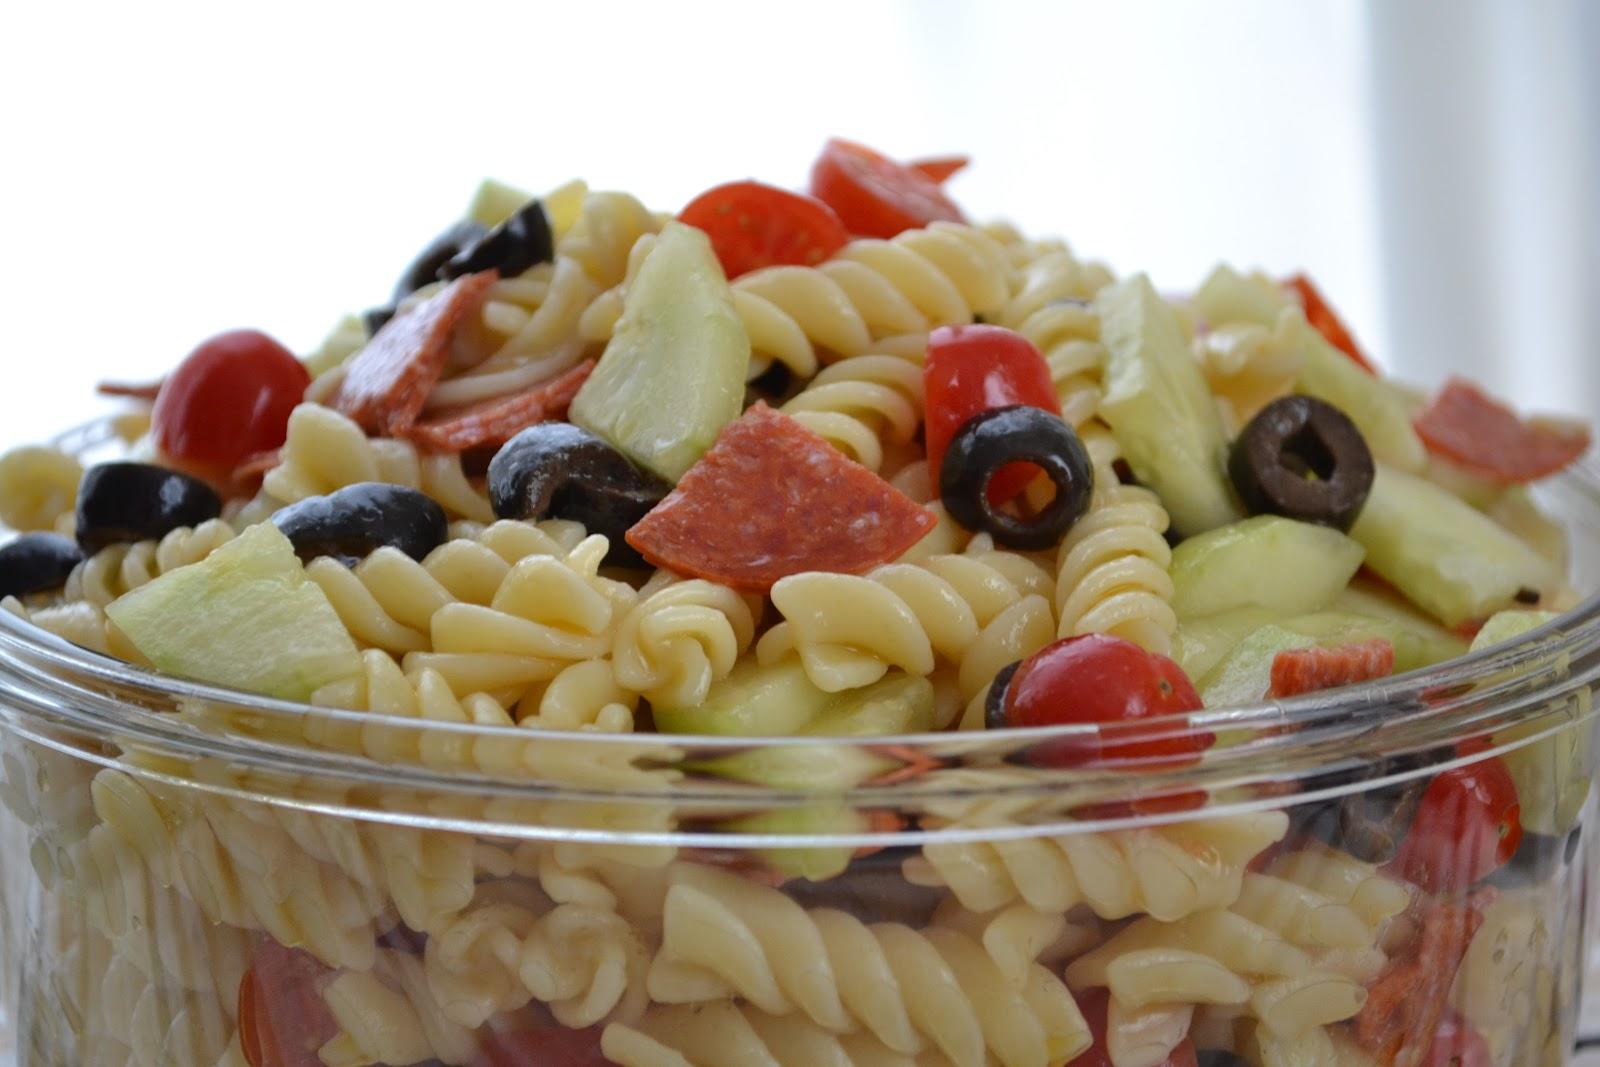 ... pasta salad italian pasta salad the ultimate pasta salad garden pasta